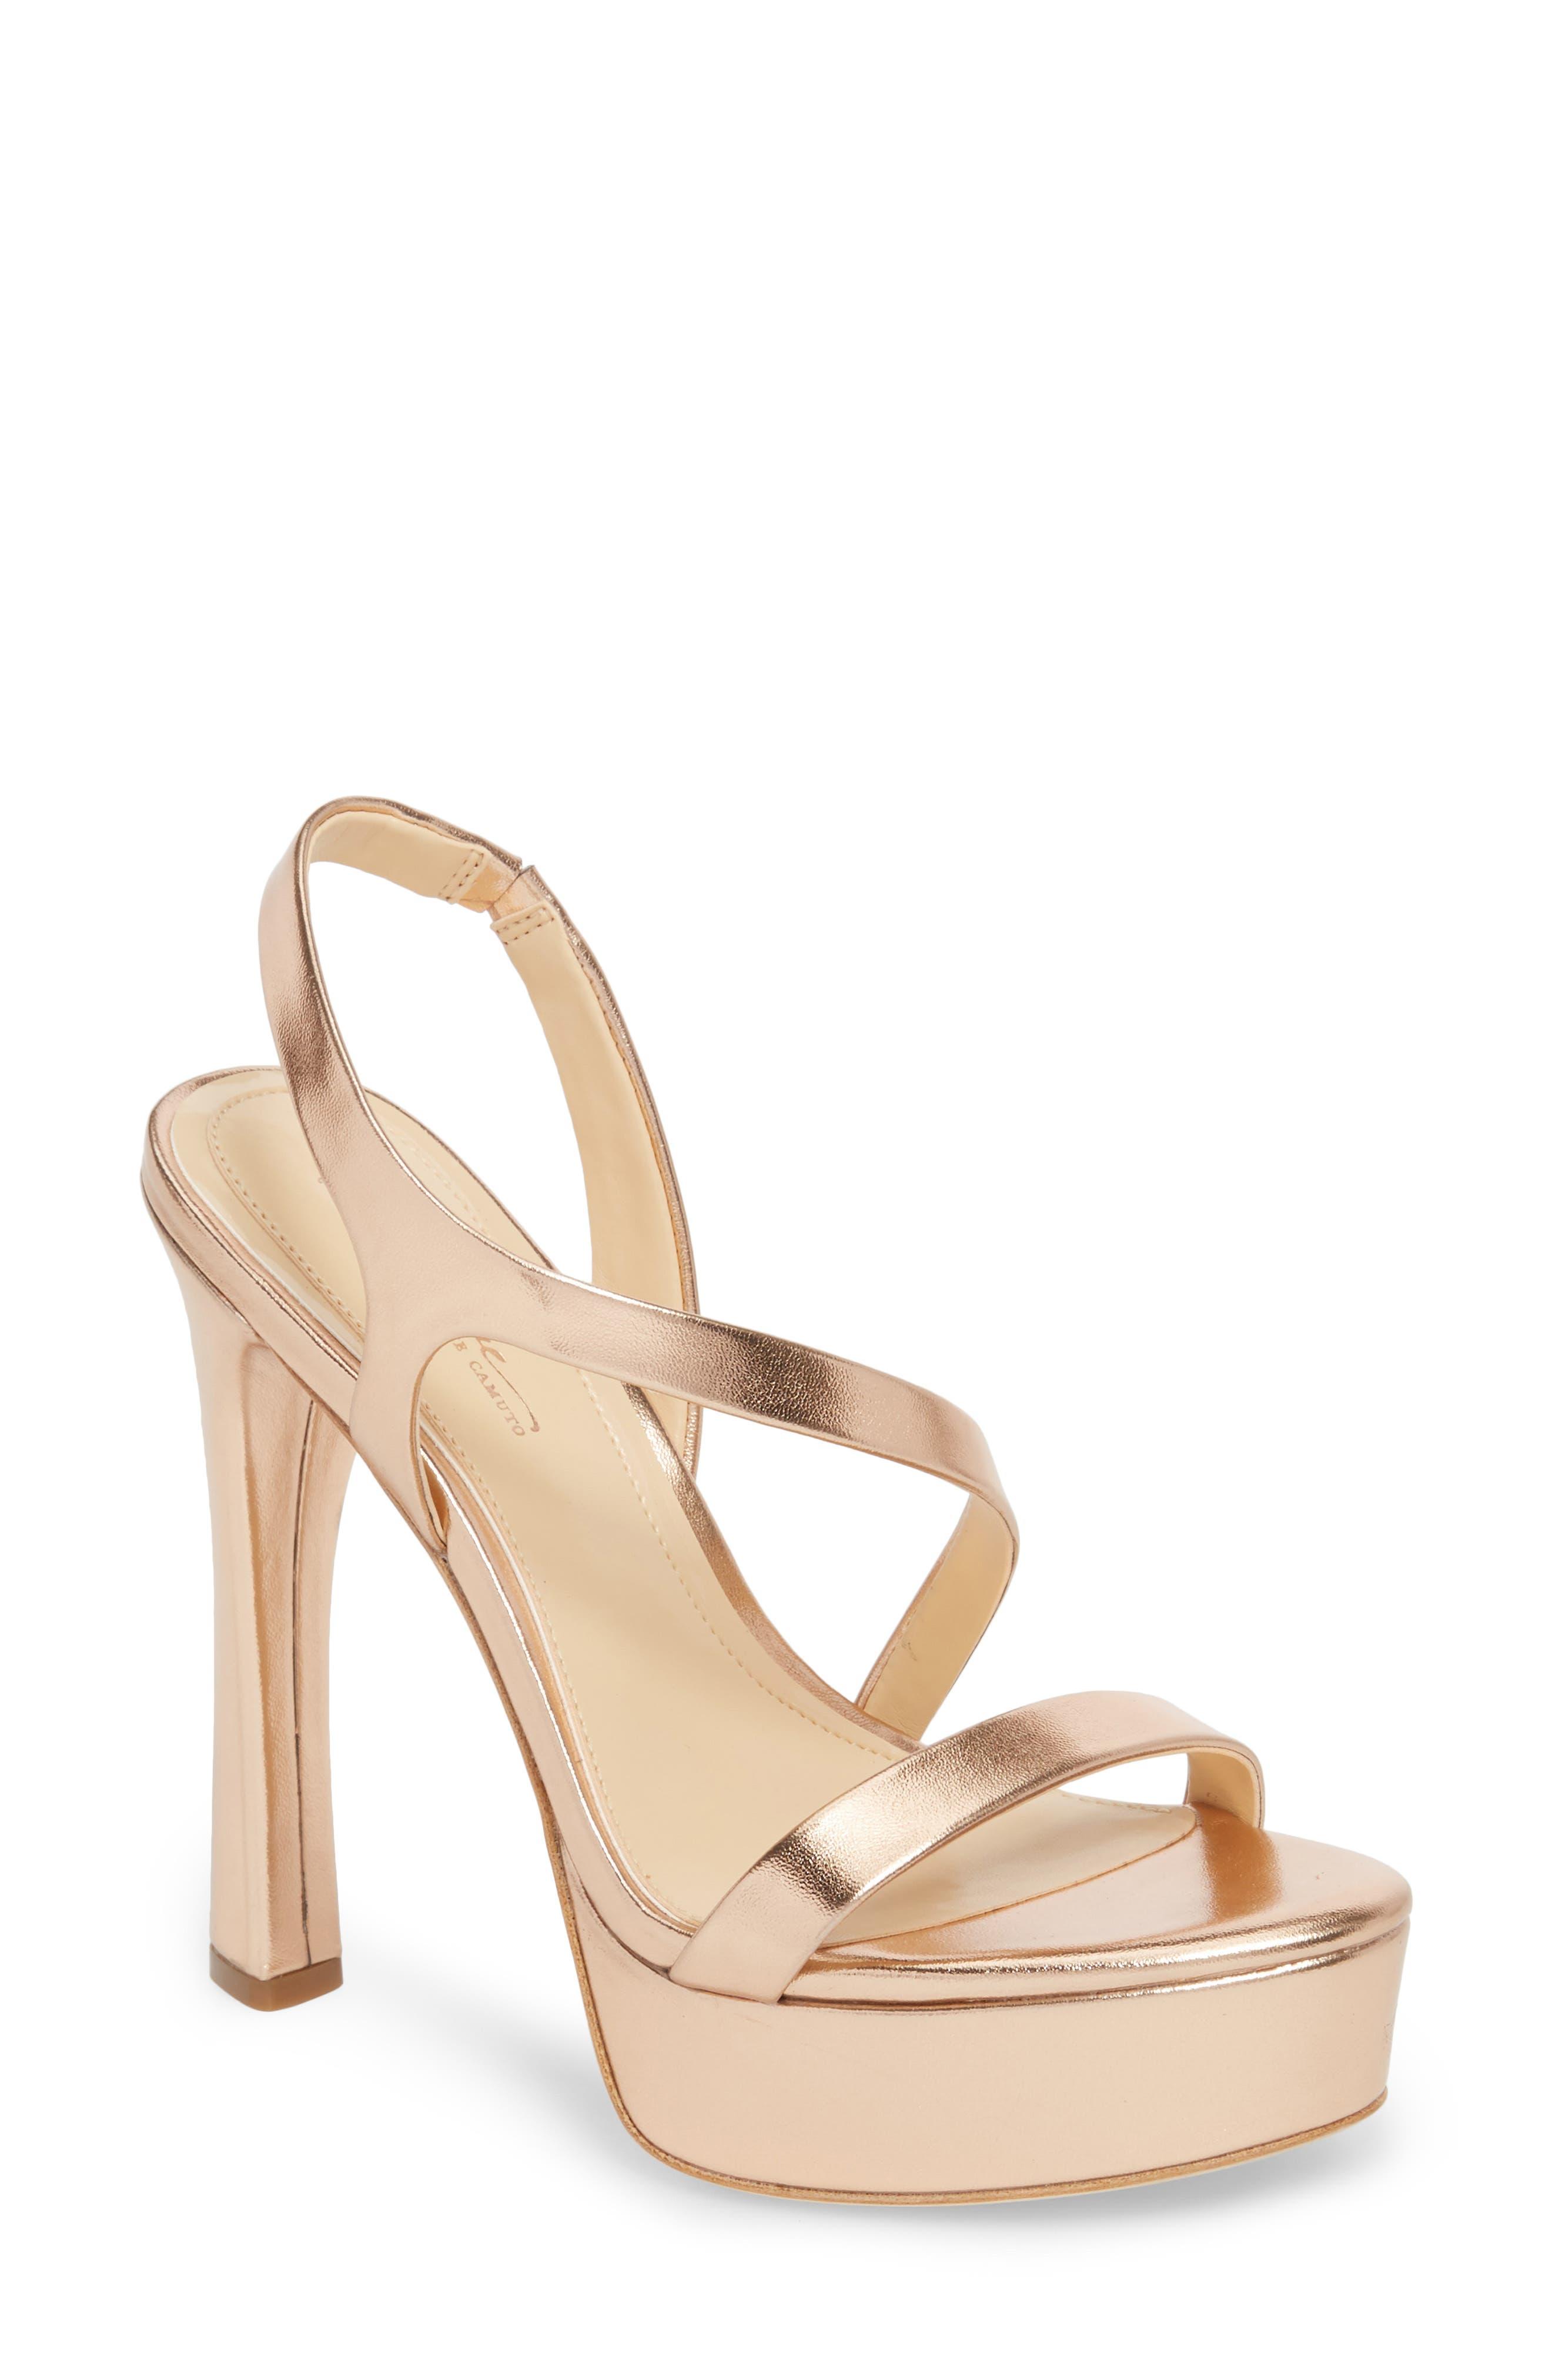 Piera Platform Sandal,                             Main thumbnail 1, color,                             ROSE GOLD LEATHER